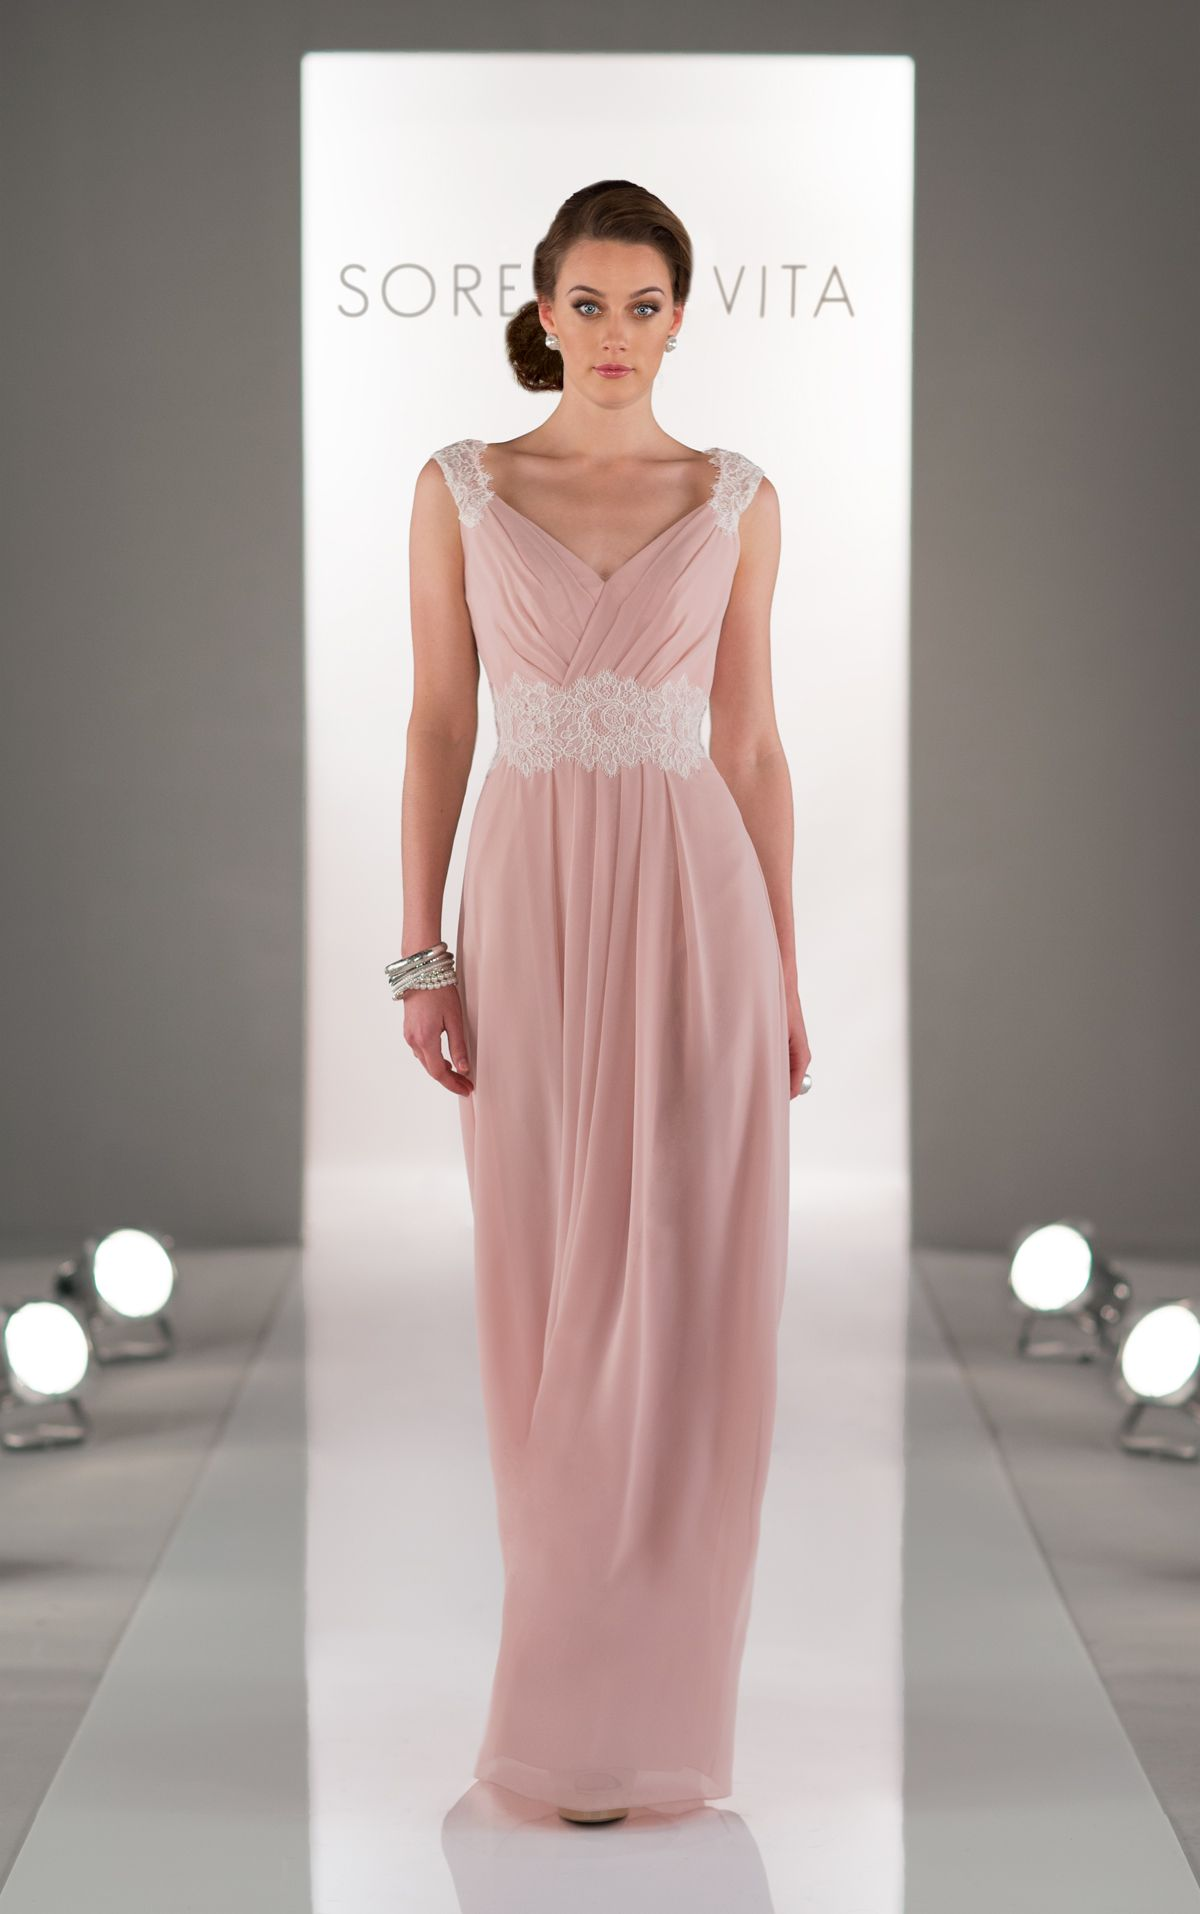 Sorella Vita 8324 | Evening gowns | Pinterest